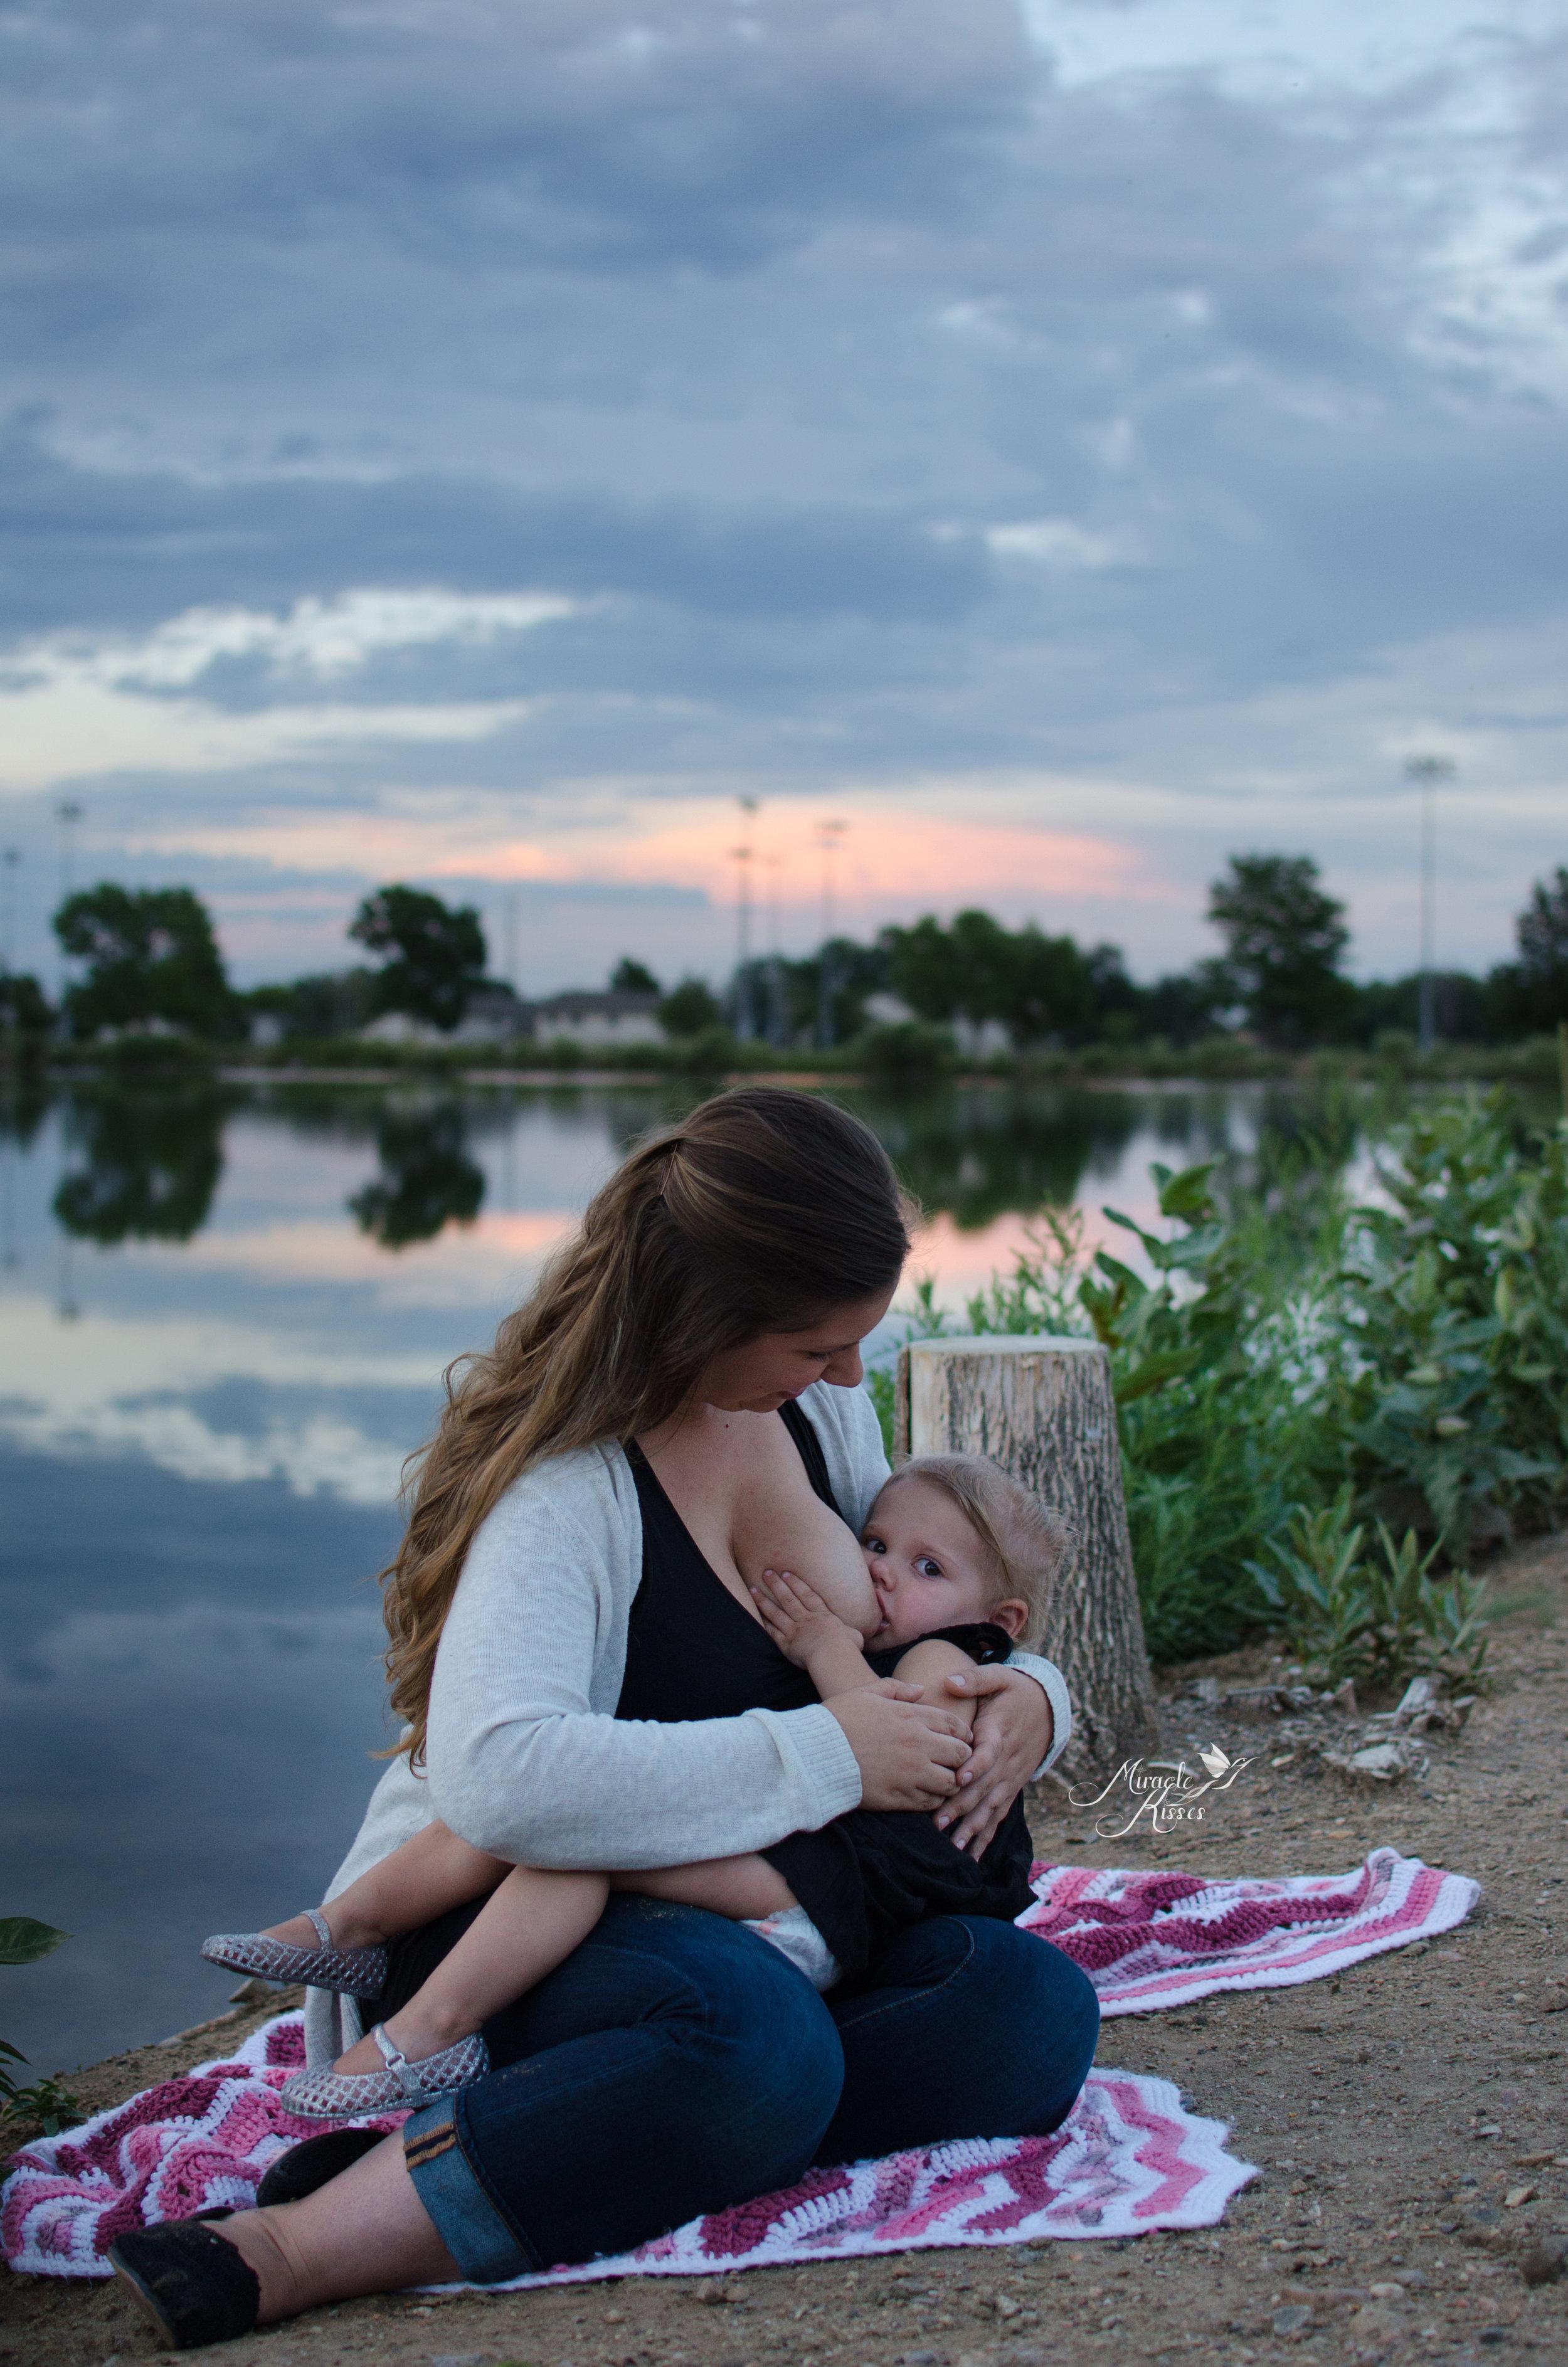 normalize extended breastfeeding, tandem nursing, sunset photography